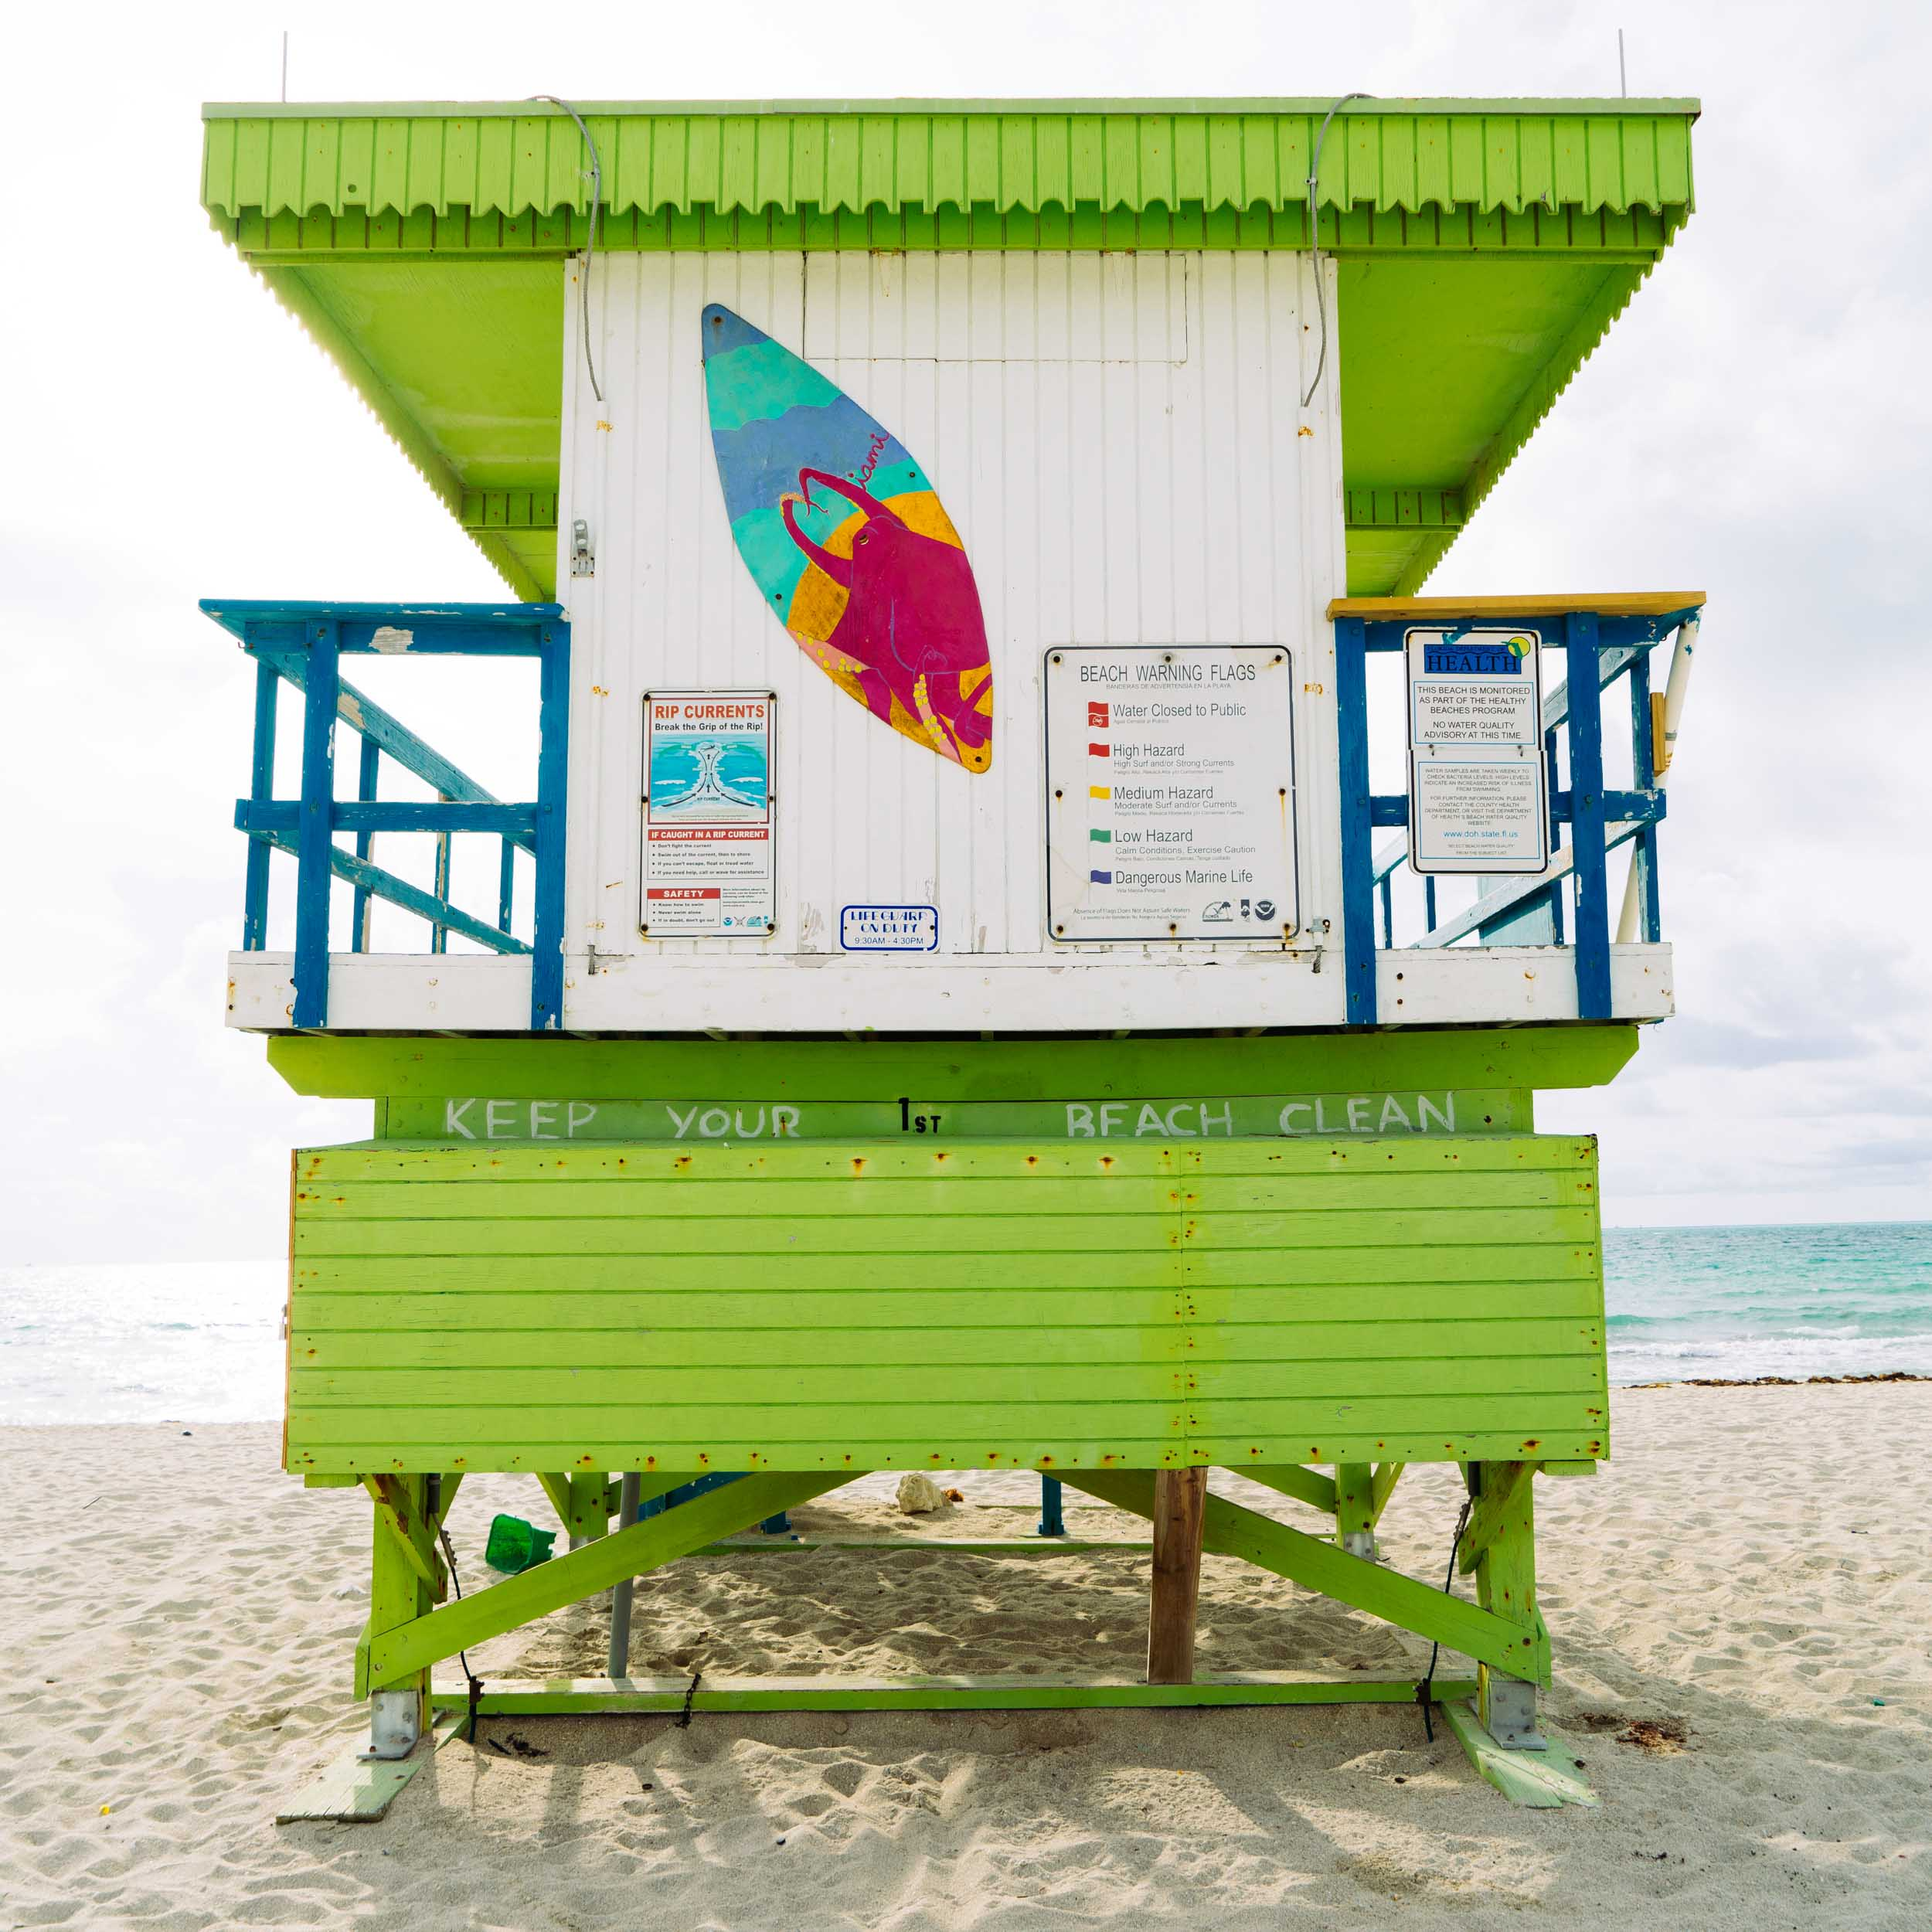 Miami Liuard Stands